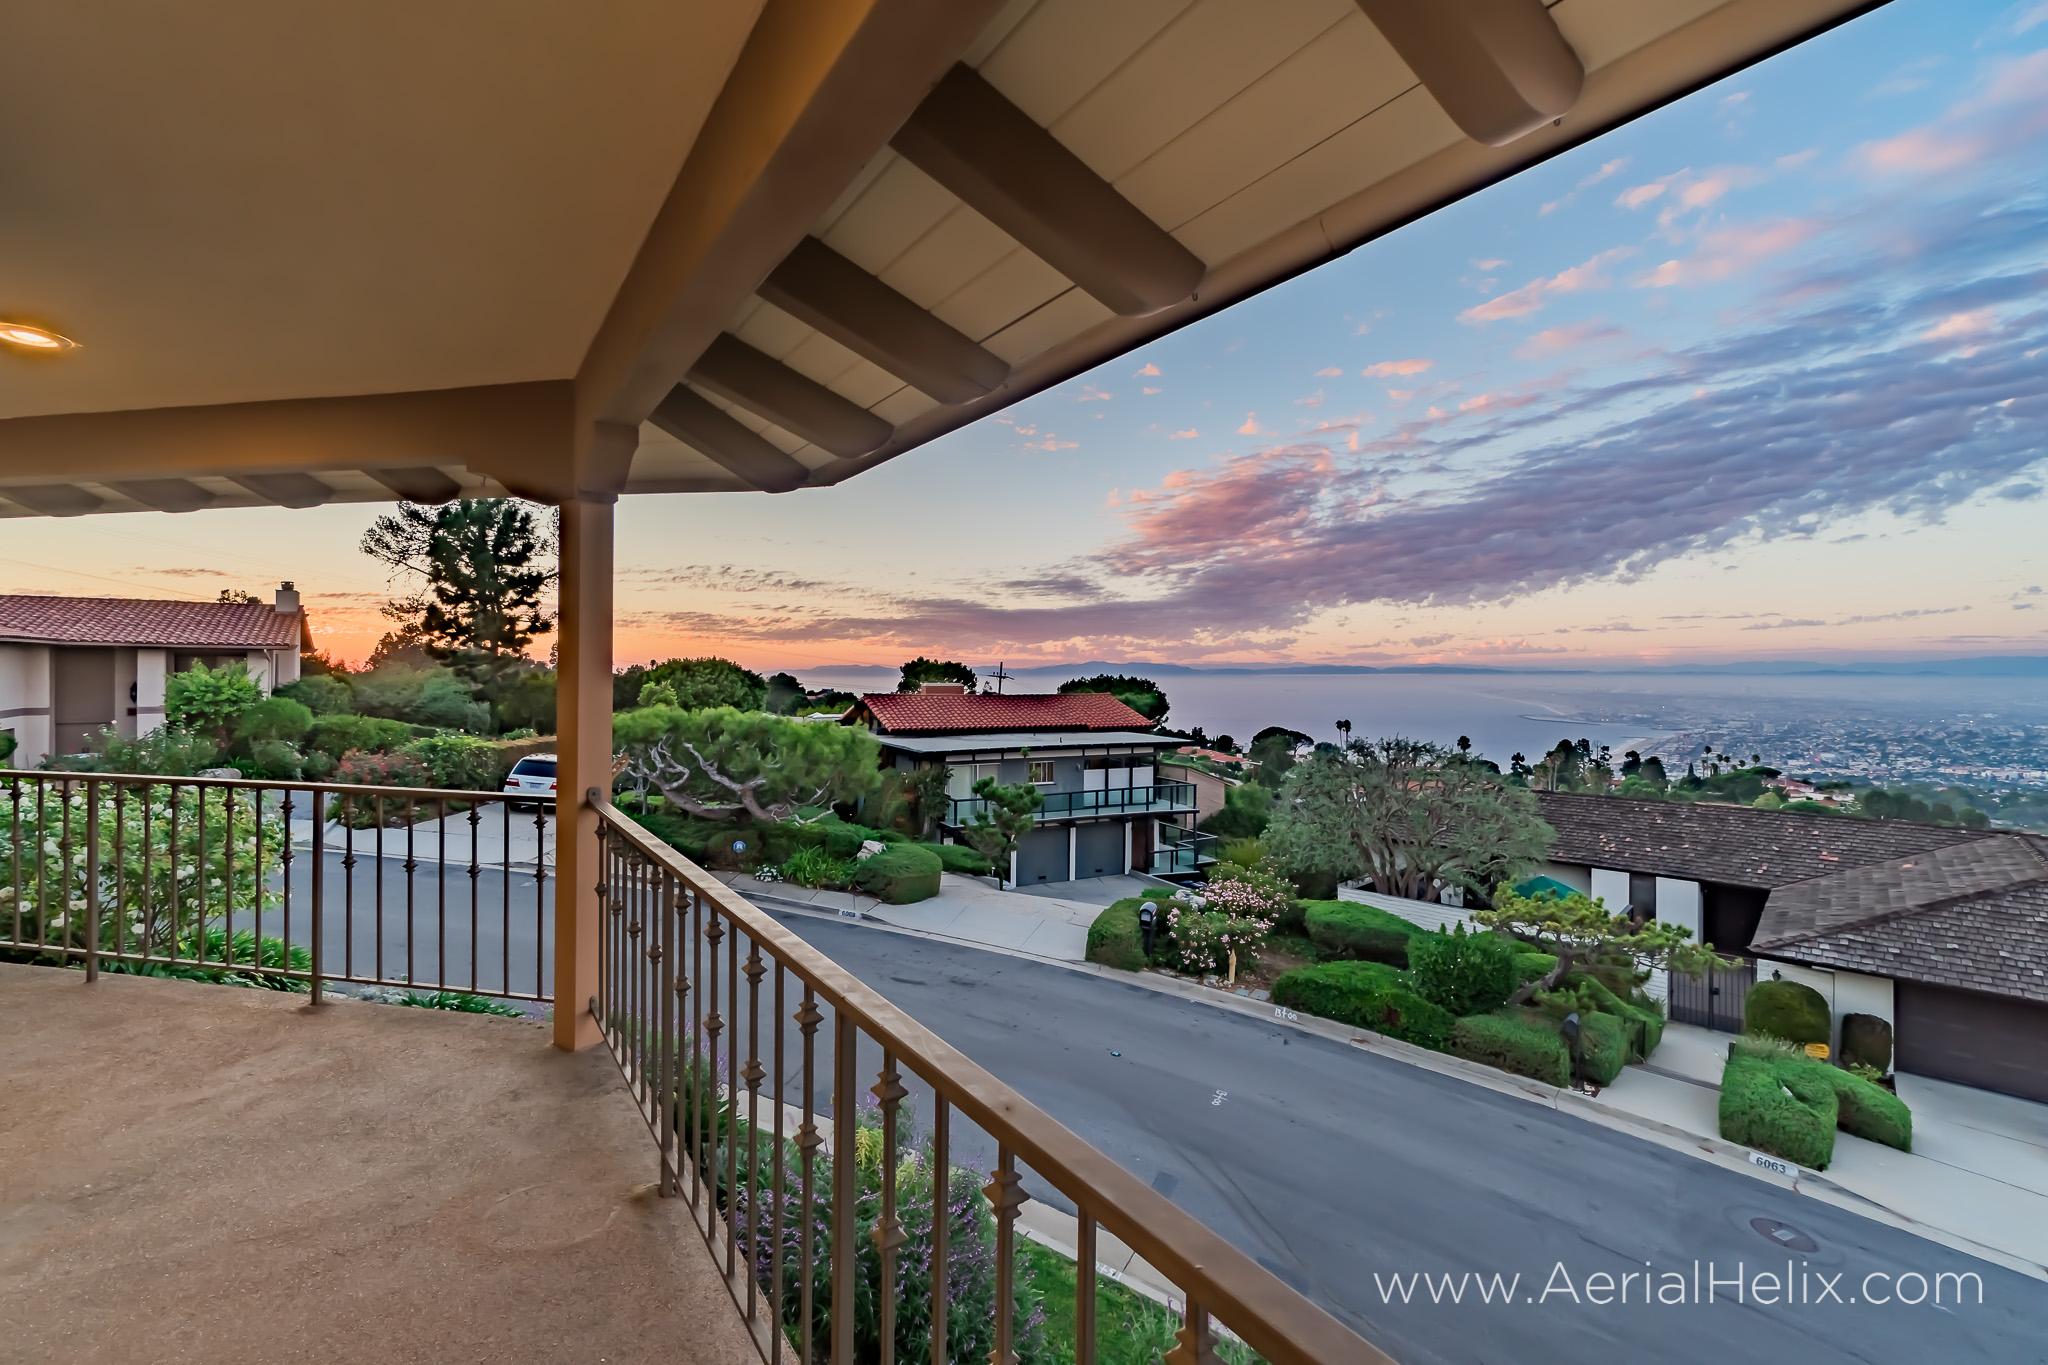 Woodfern Drive Ground- HELIX Real Estate Aerial Photographer-36.jpg